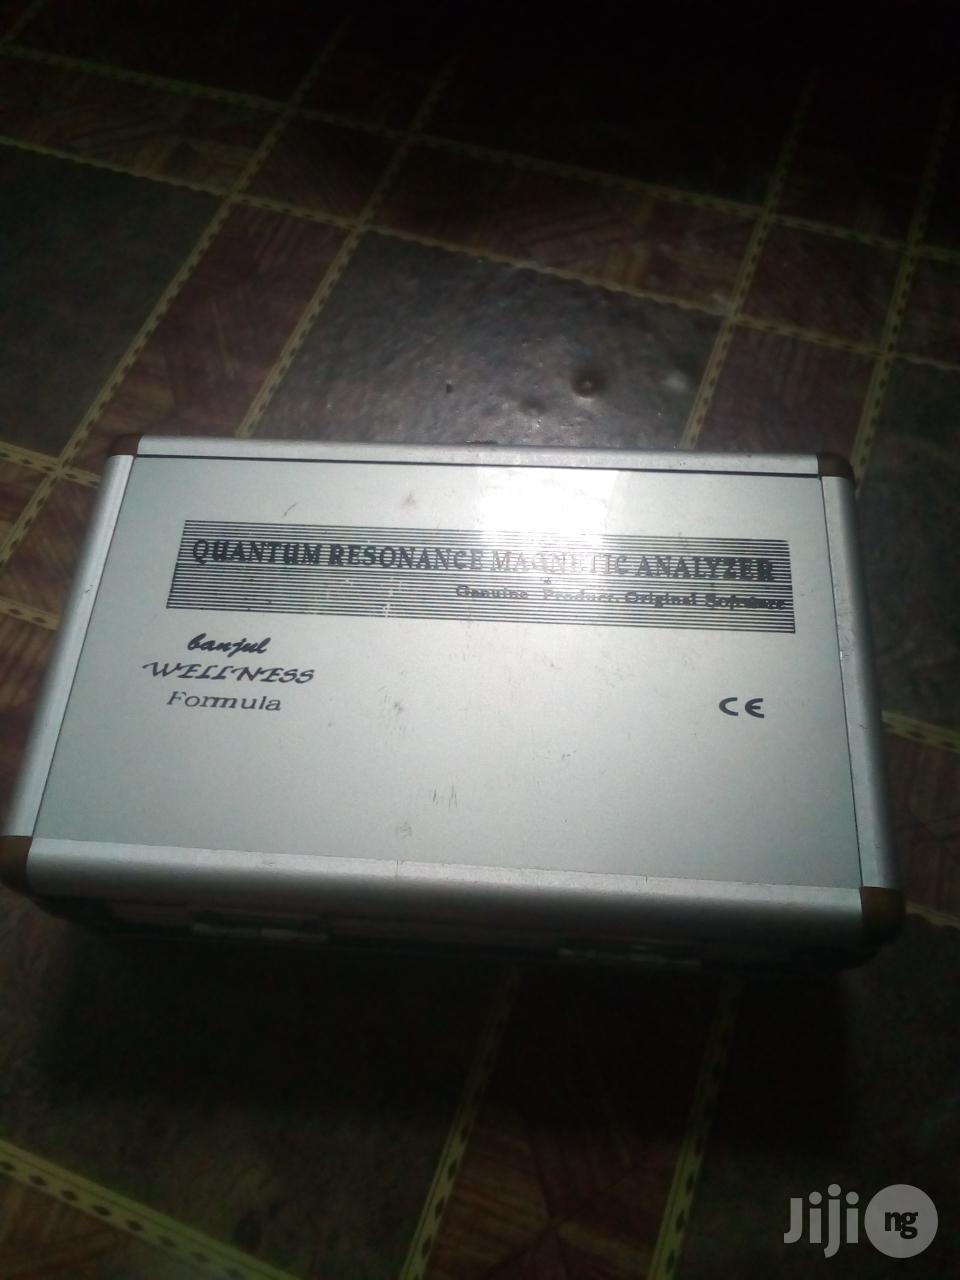 QRMA(Quantum Resonance Magnetic Analyser)   Medical Equipment for sale in Garki 1, Abuja (FCT) State, Nigeria